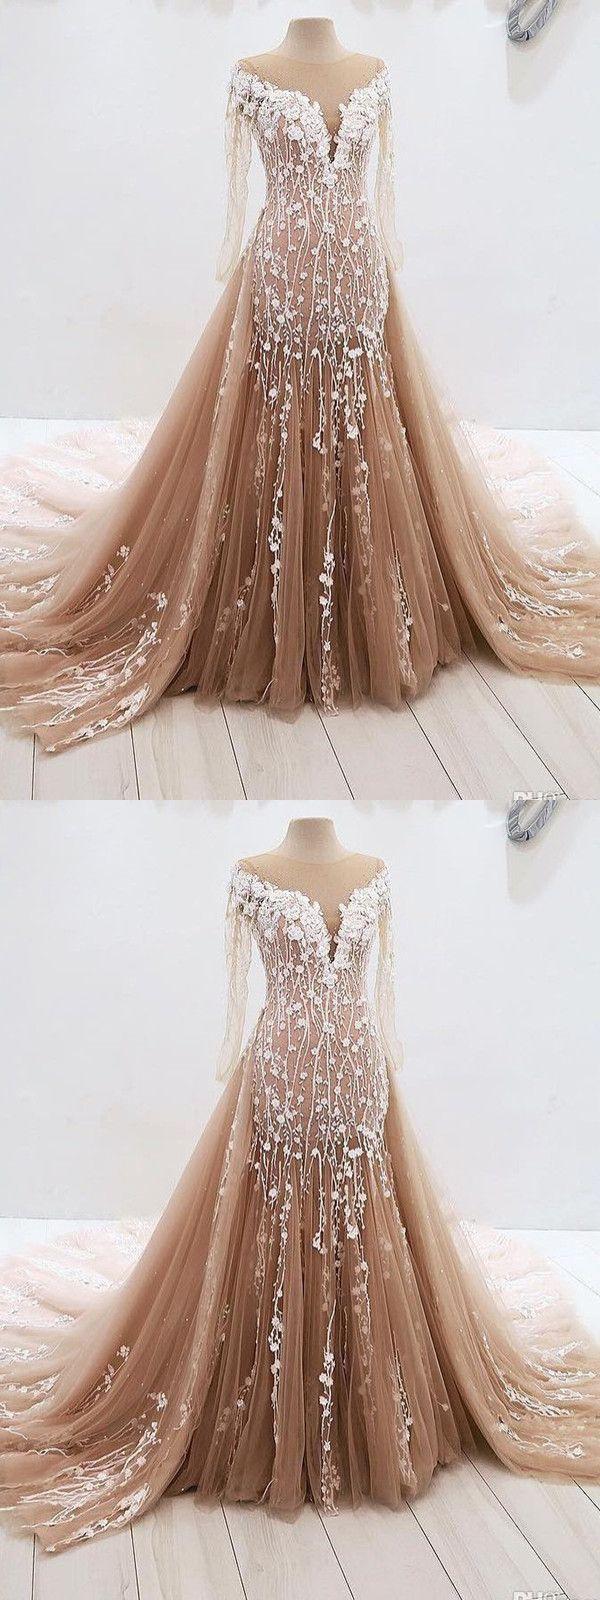 Chic mermaid vintage prom dress african long sleeve prom dress